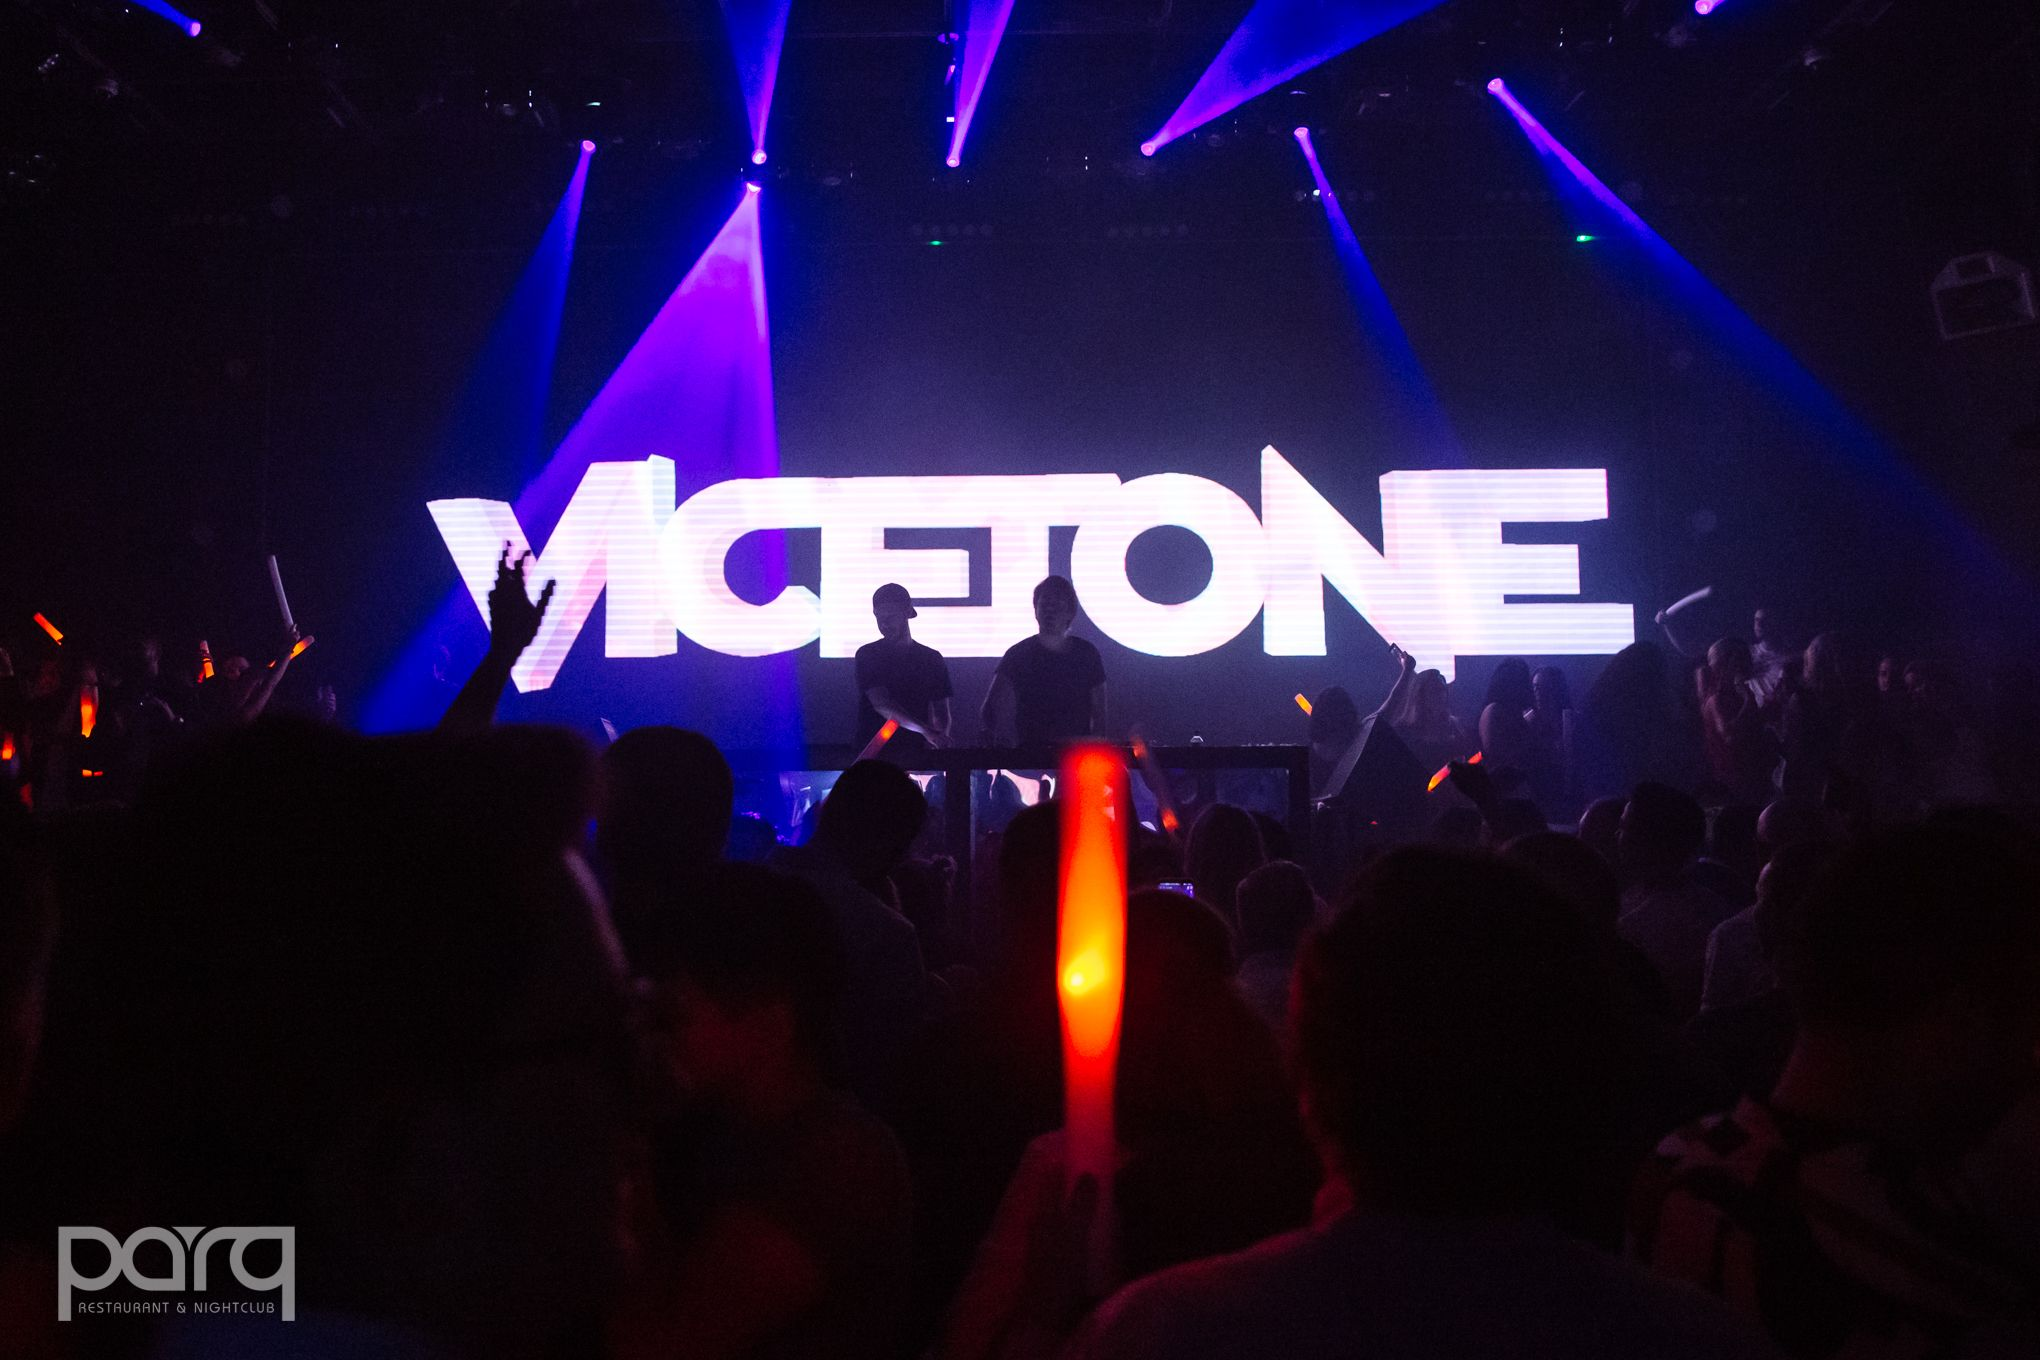 04.06.19 Parq - Vicetone-14.jpg